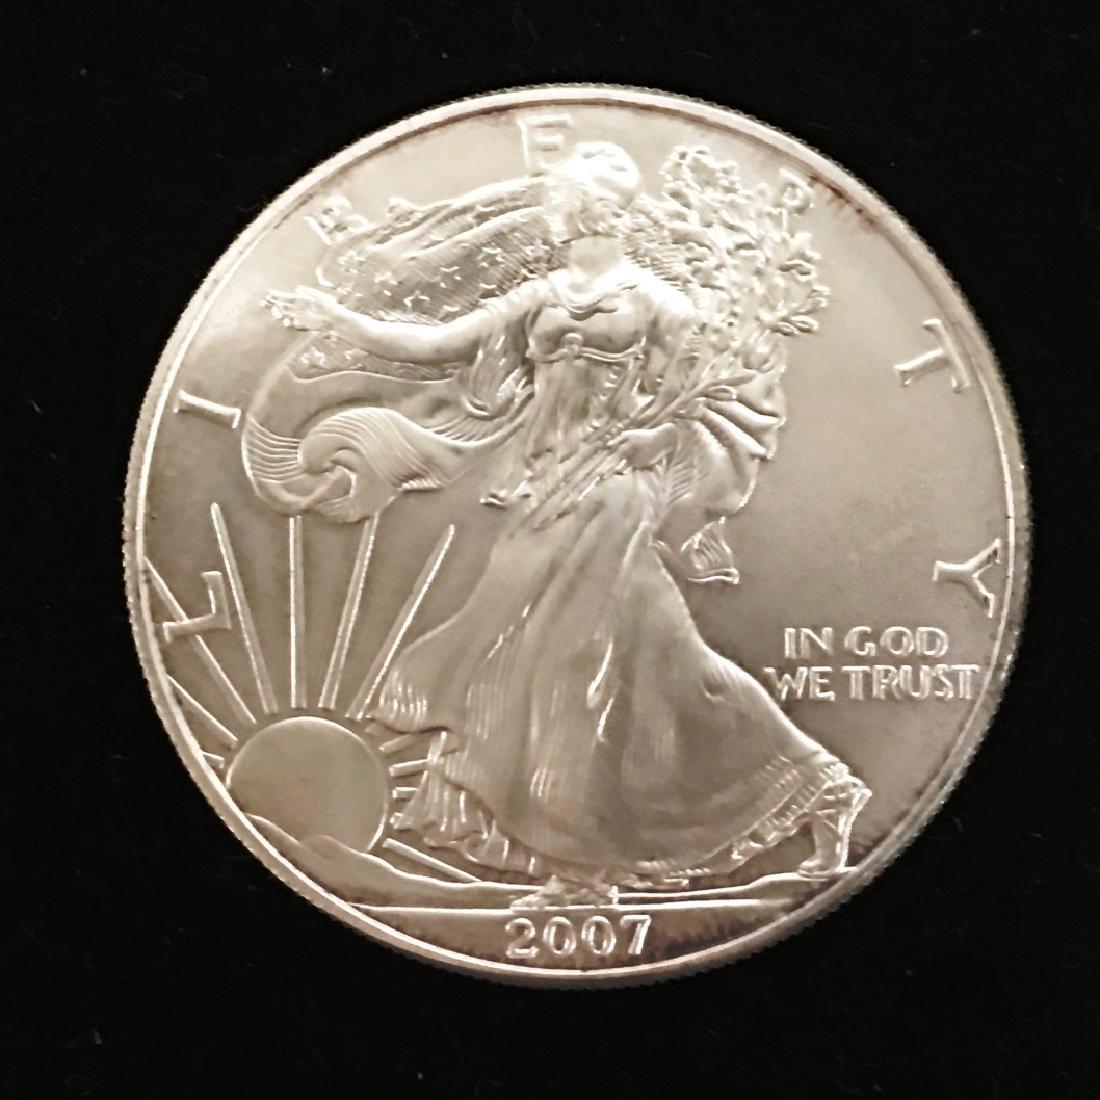 2007 SILVER EAGLE $1